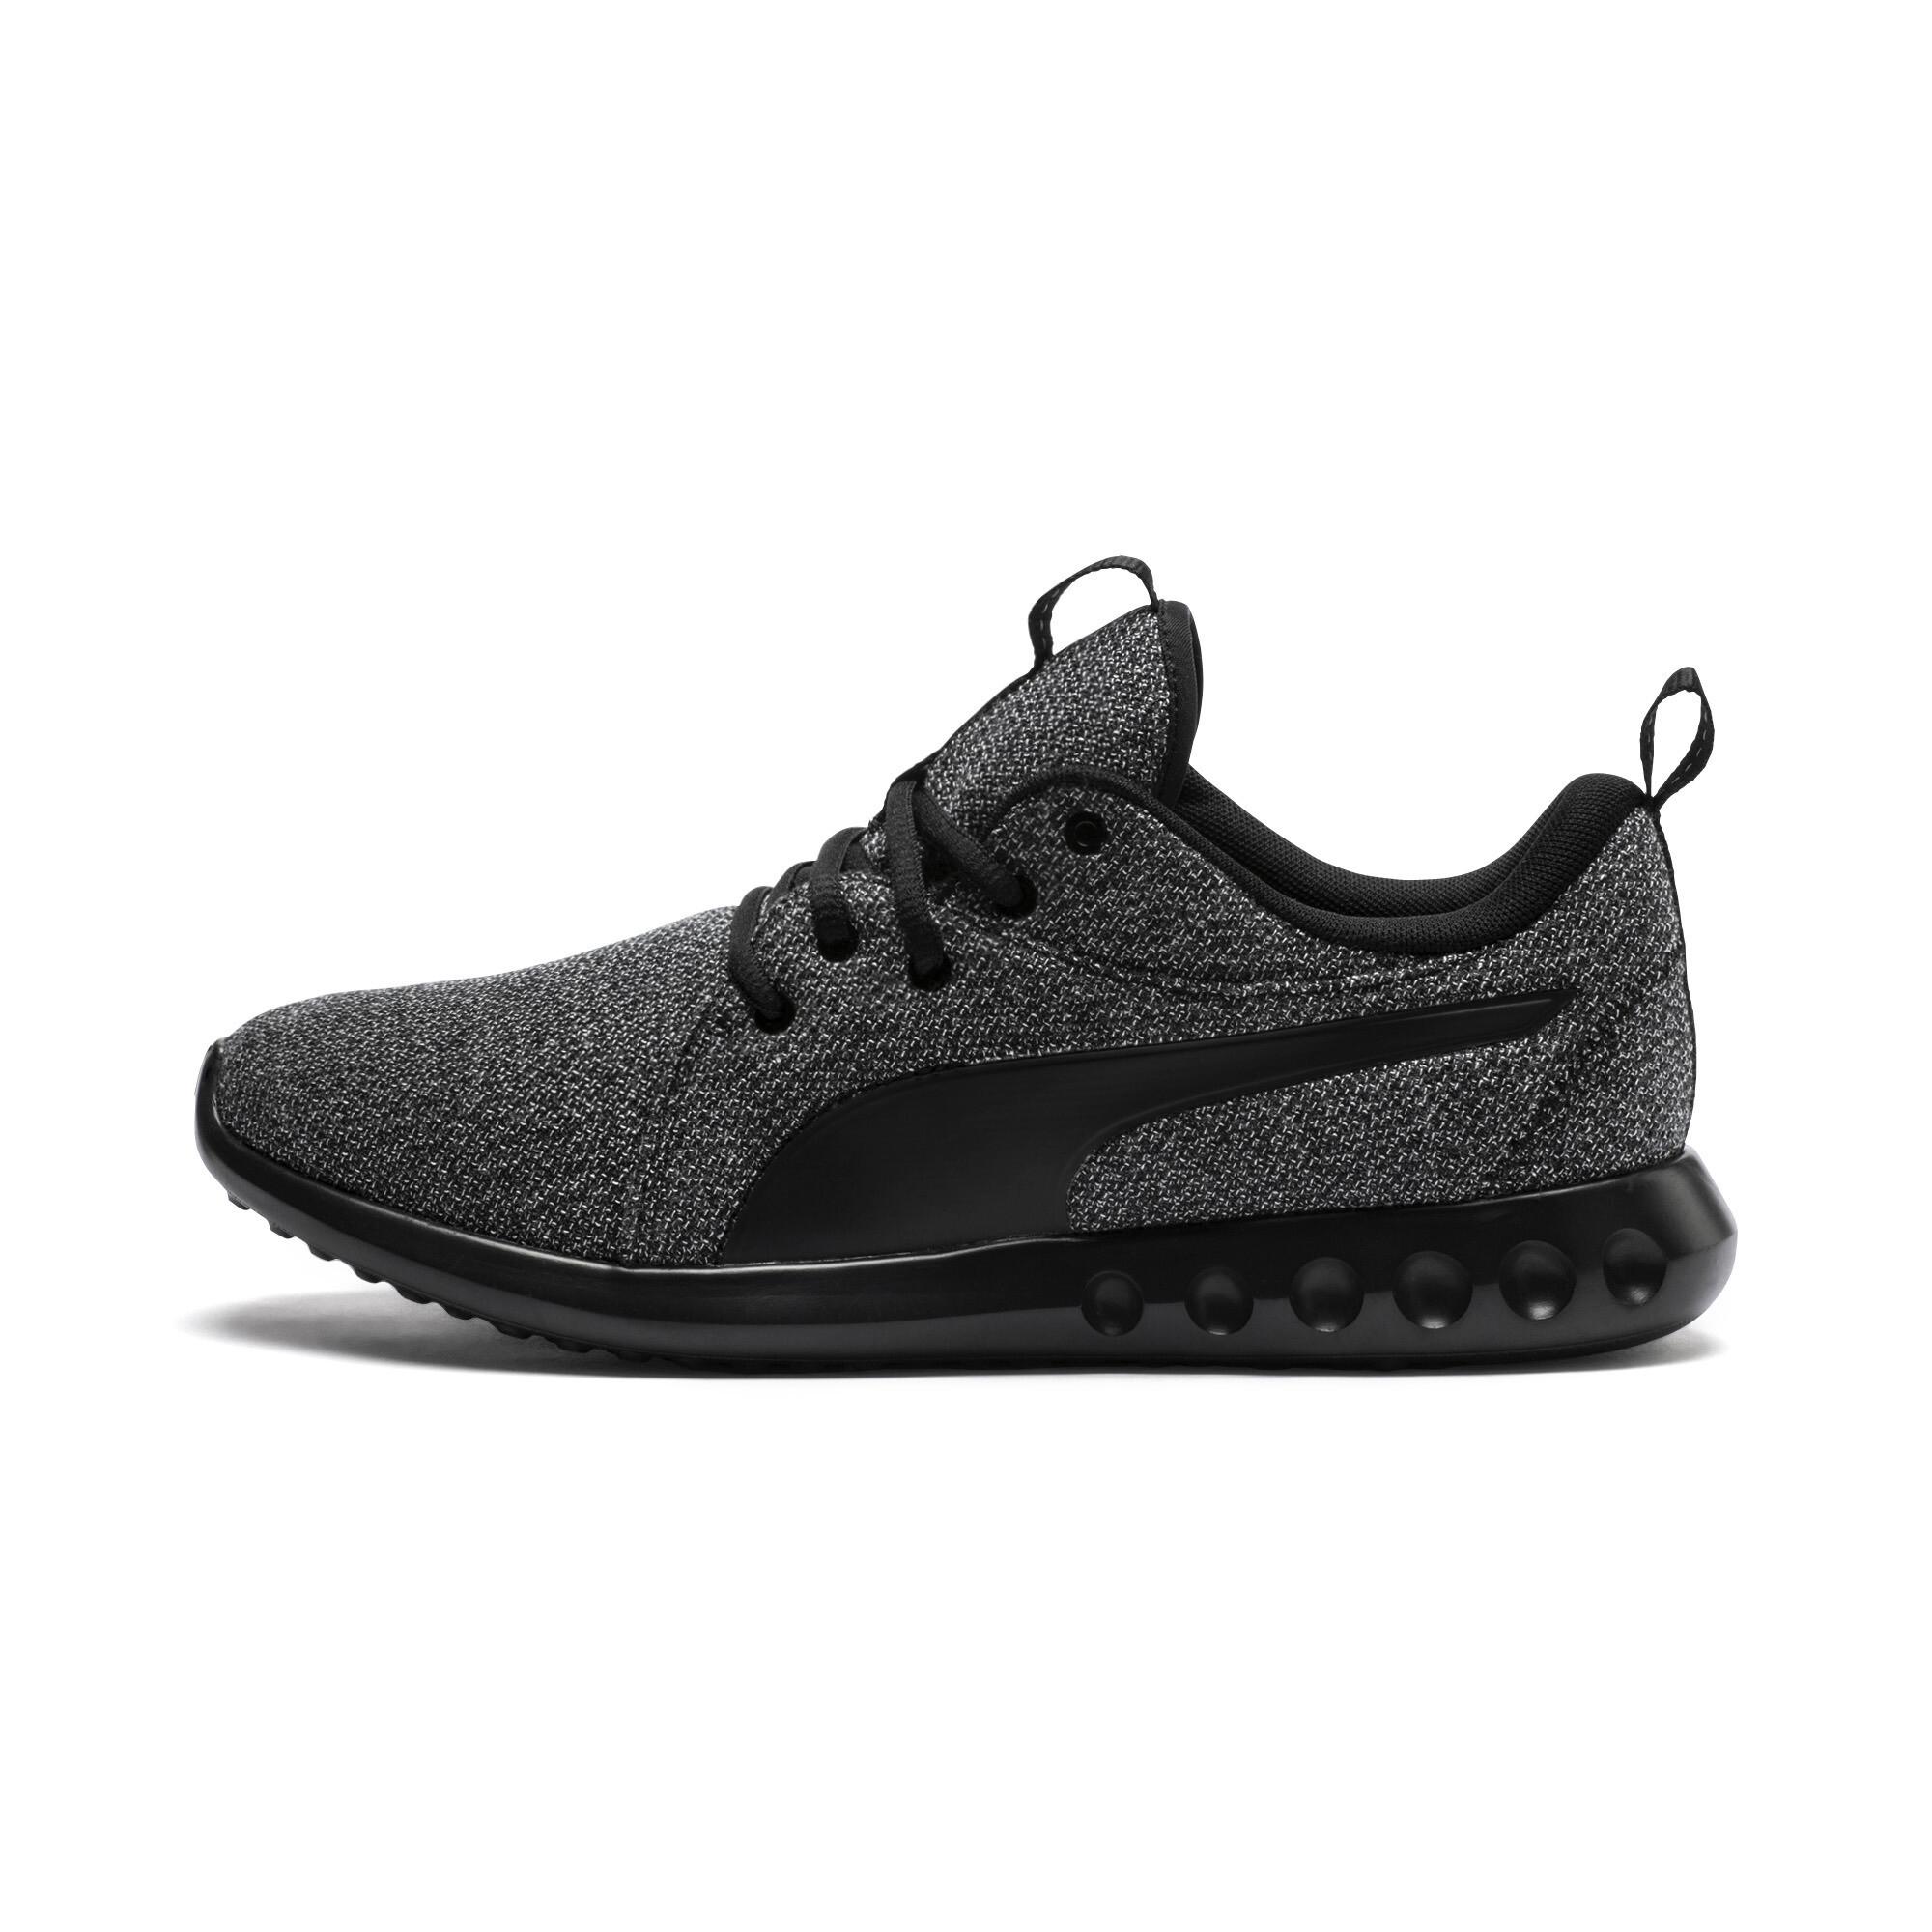 PUMA-Carson-2-Knit-Men-039-s-Training-Shoes-Men-Shoe-Running thumbnail 4